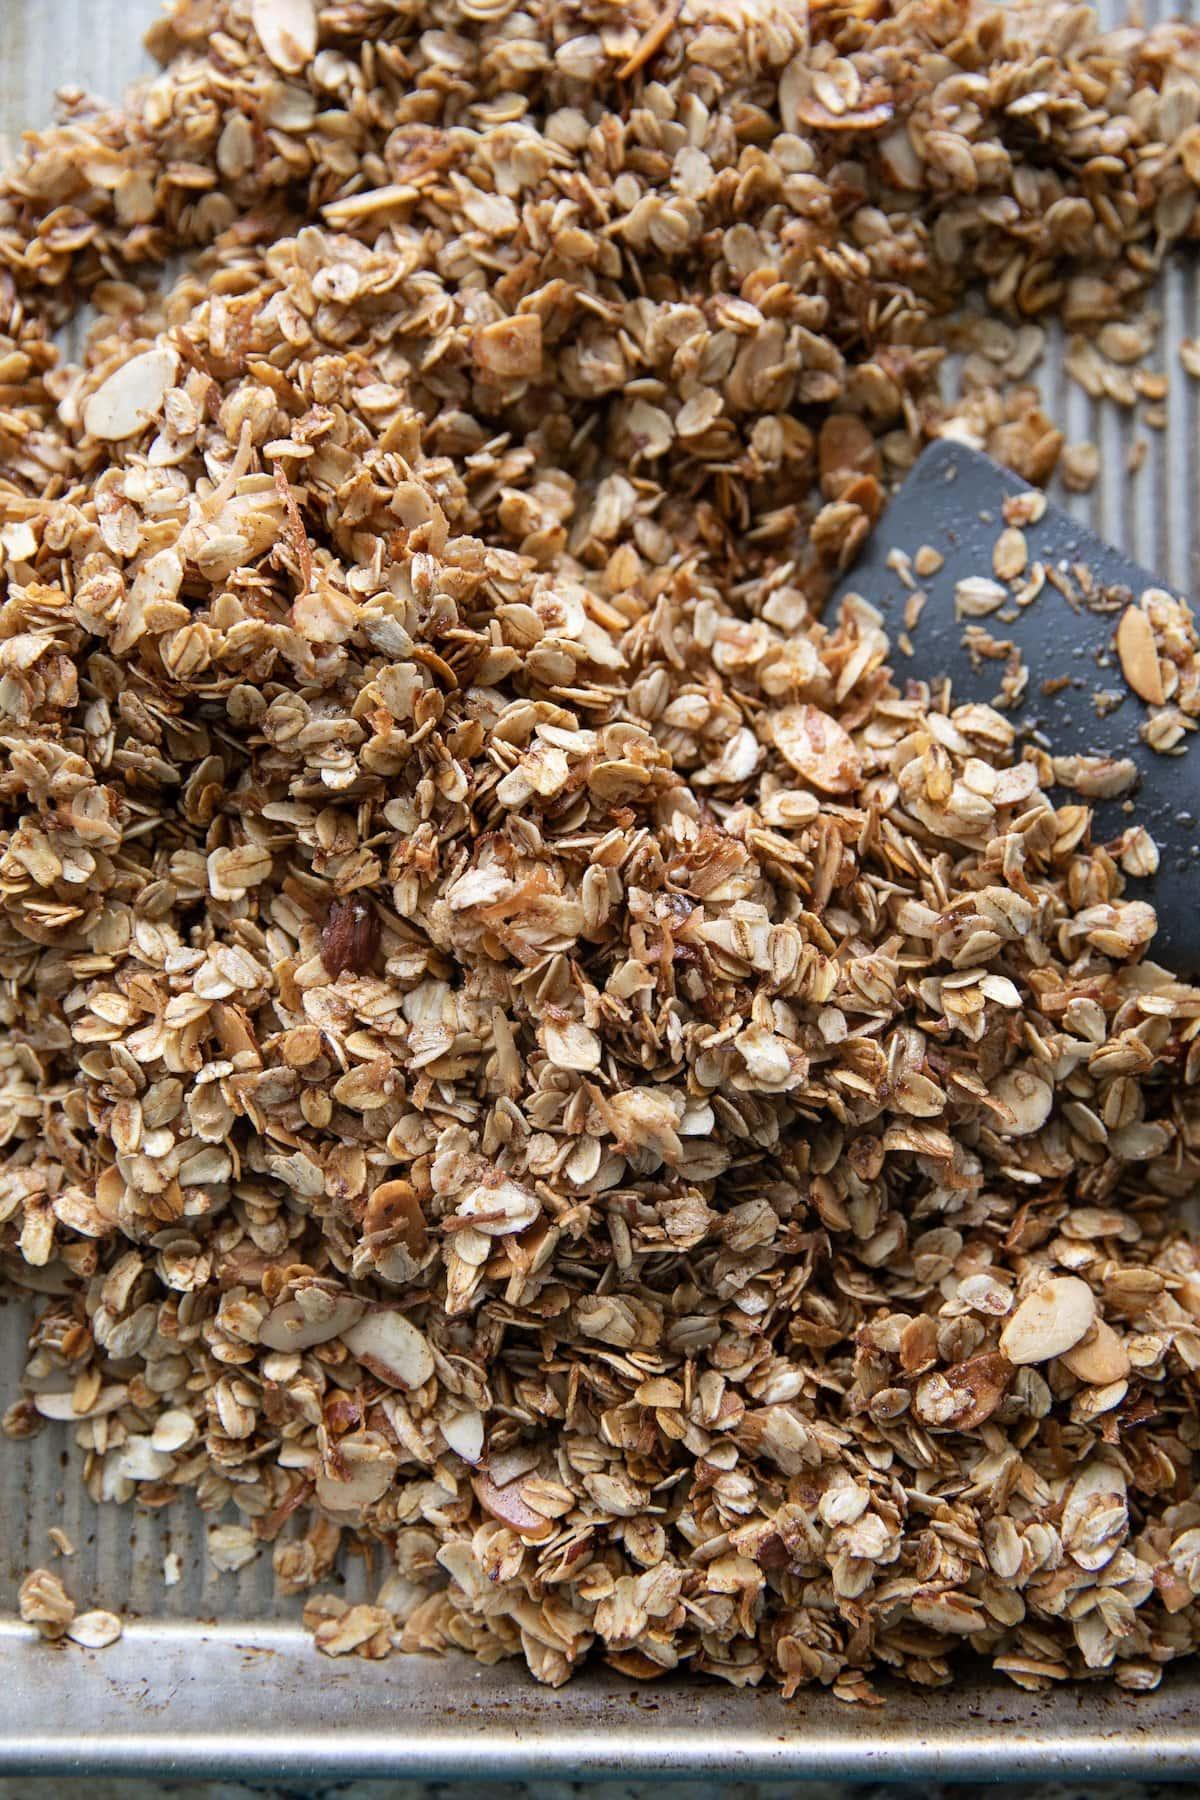 homemade granola in a baking sheet